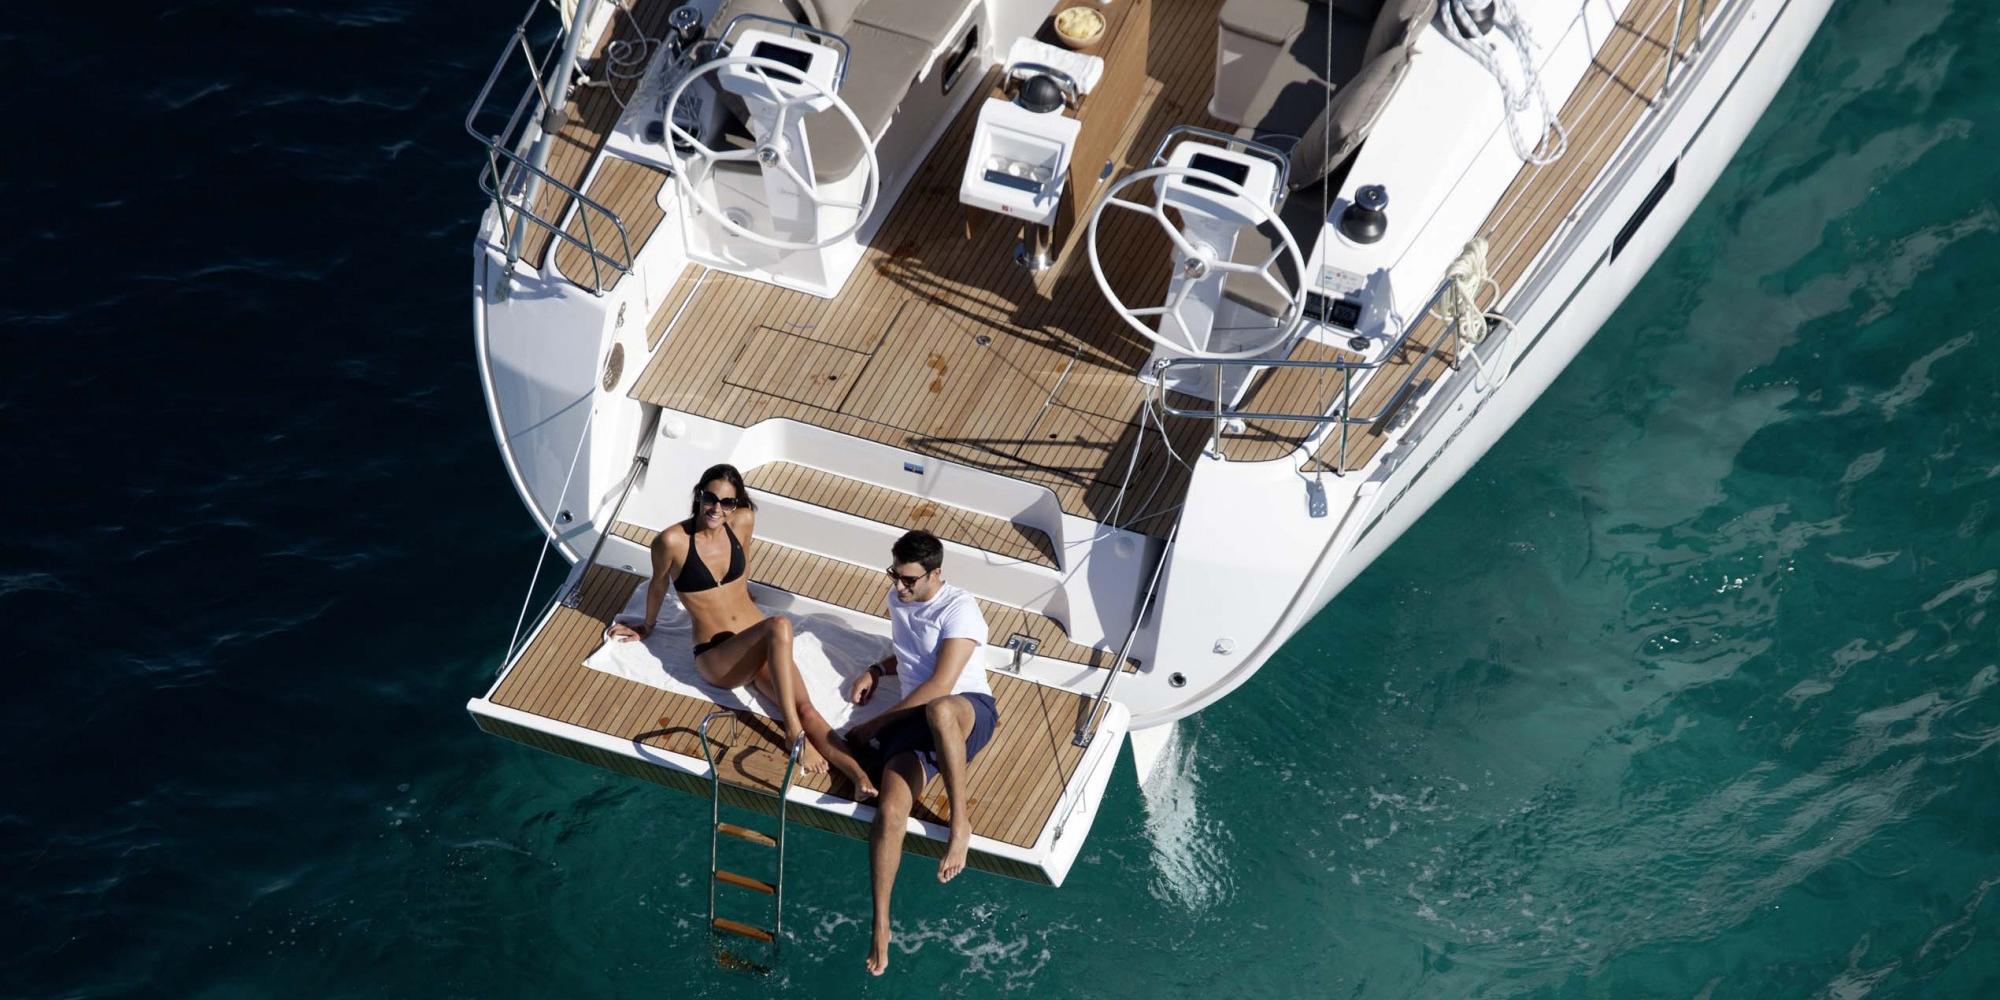 Puntea-Terasa-Inchiriere-Petreceri-Croaziere-Vacante-Yacht-Bavaria-Cruise46_1